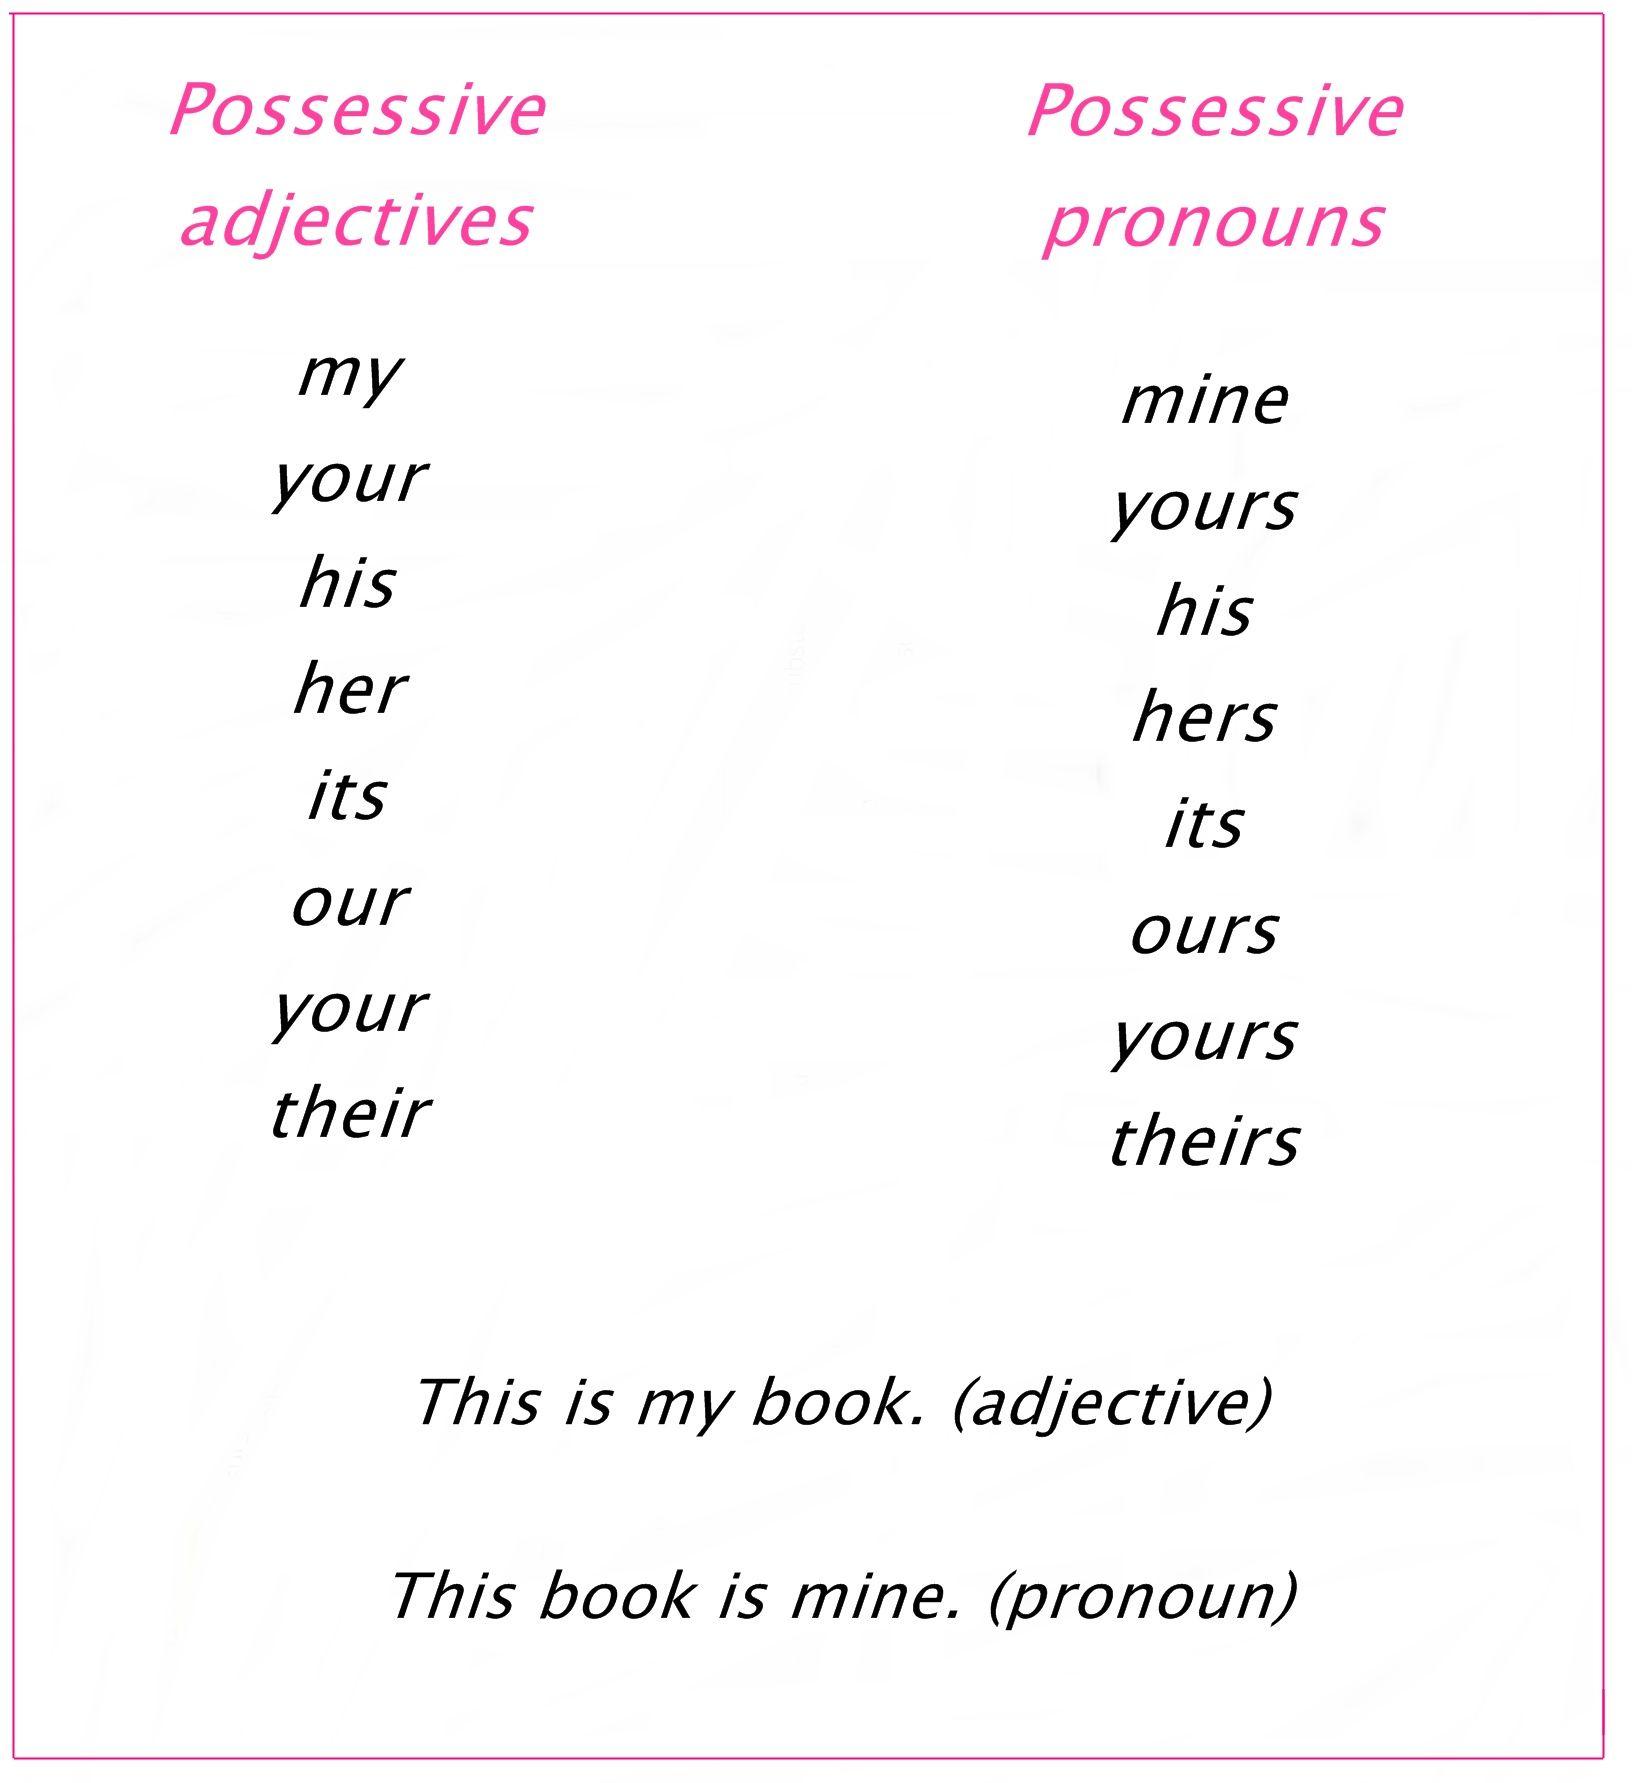 possessive determiners and pronouns exercises pdf